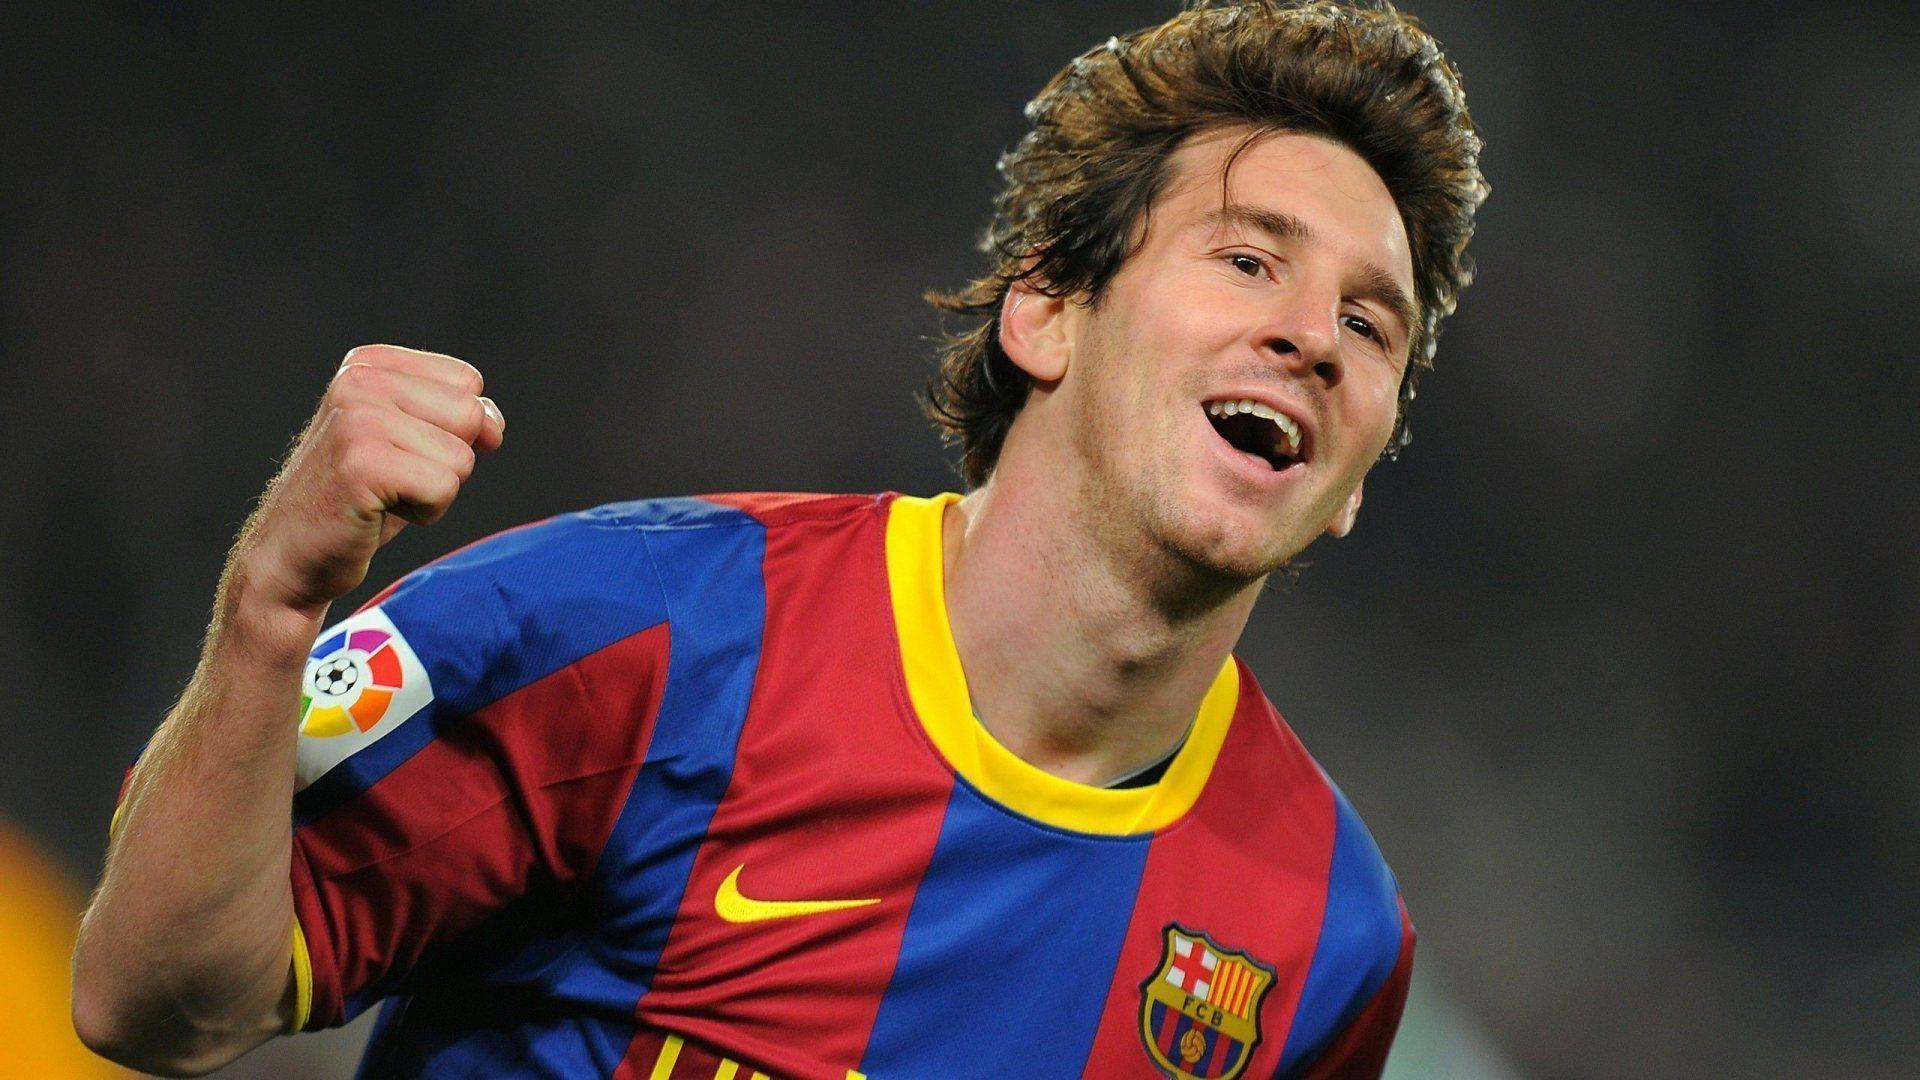 Messi 2012 - Messi hd - Messi wallpaper - Messi image hd - Messi ...